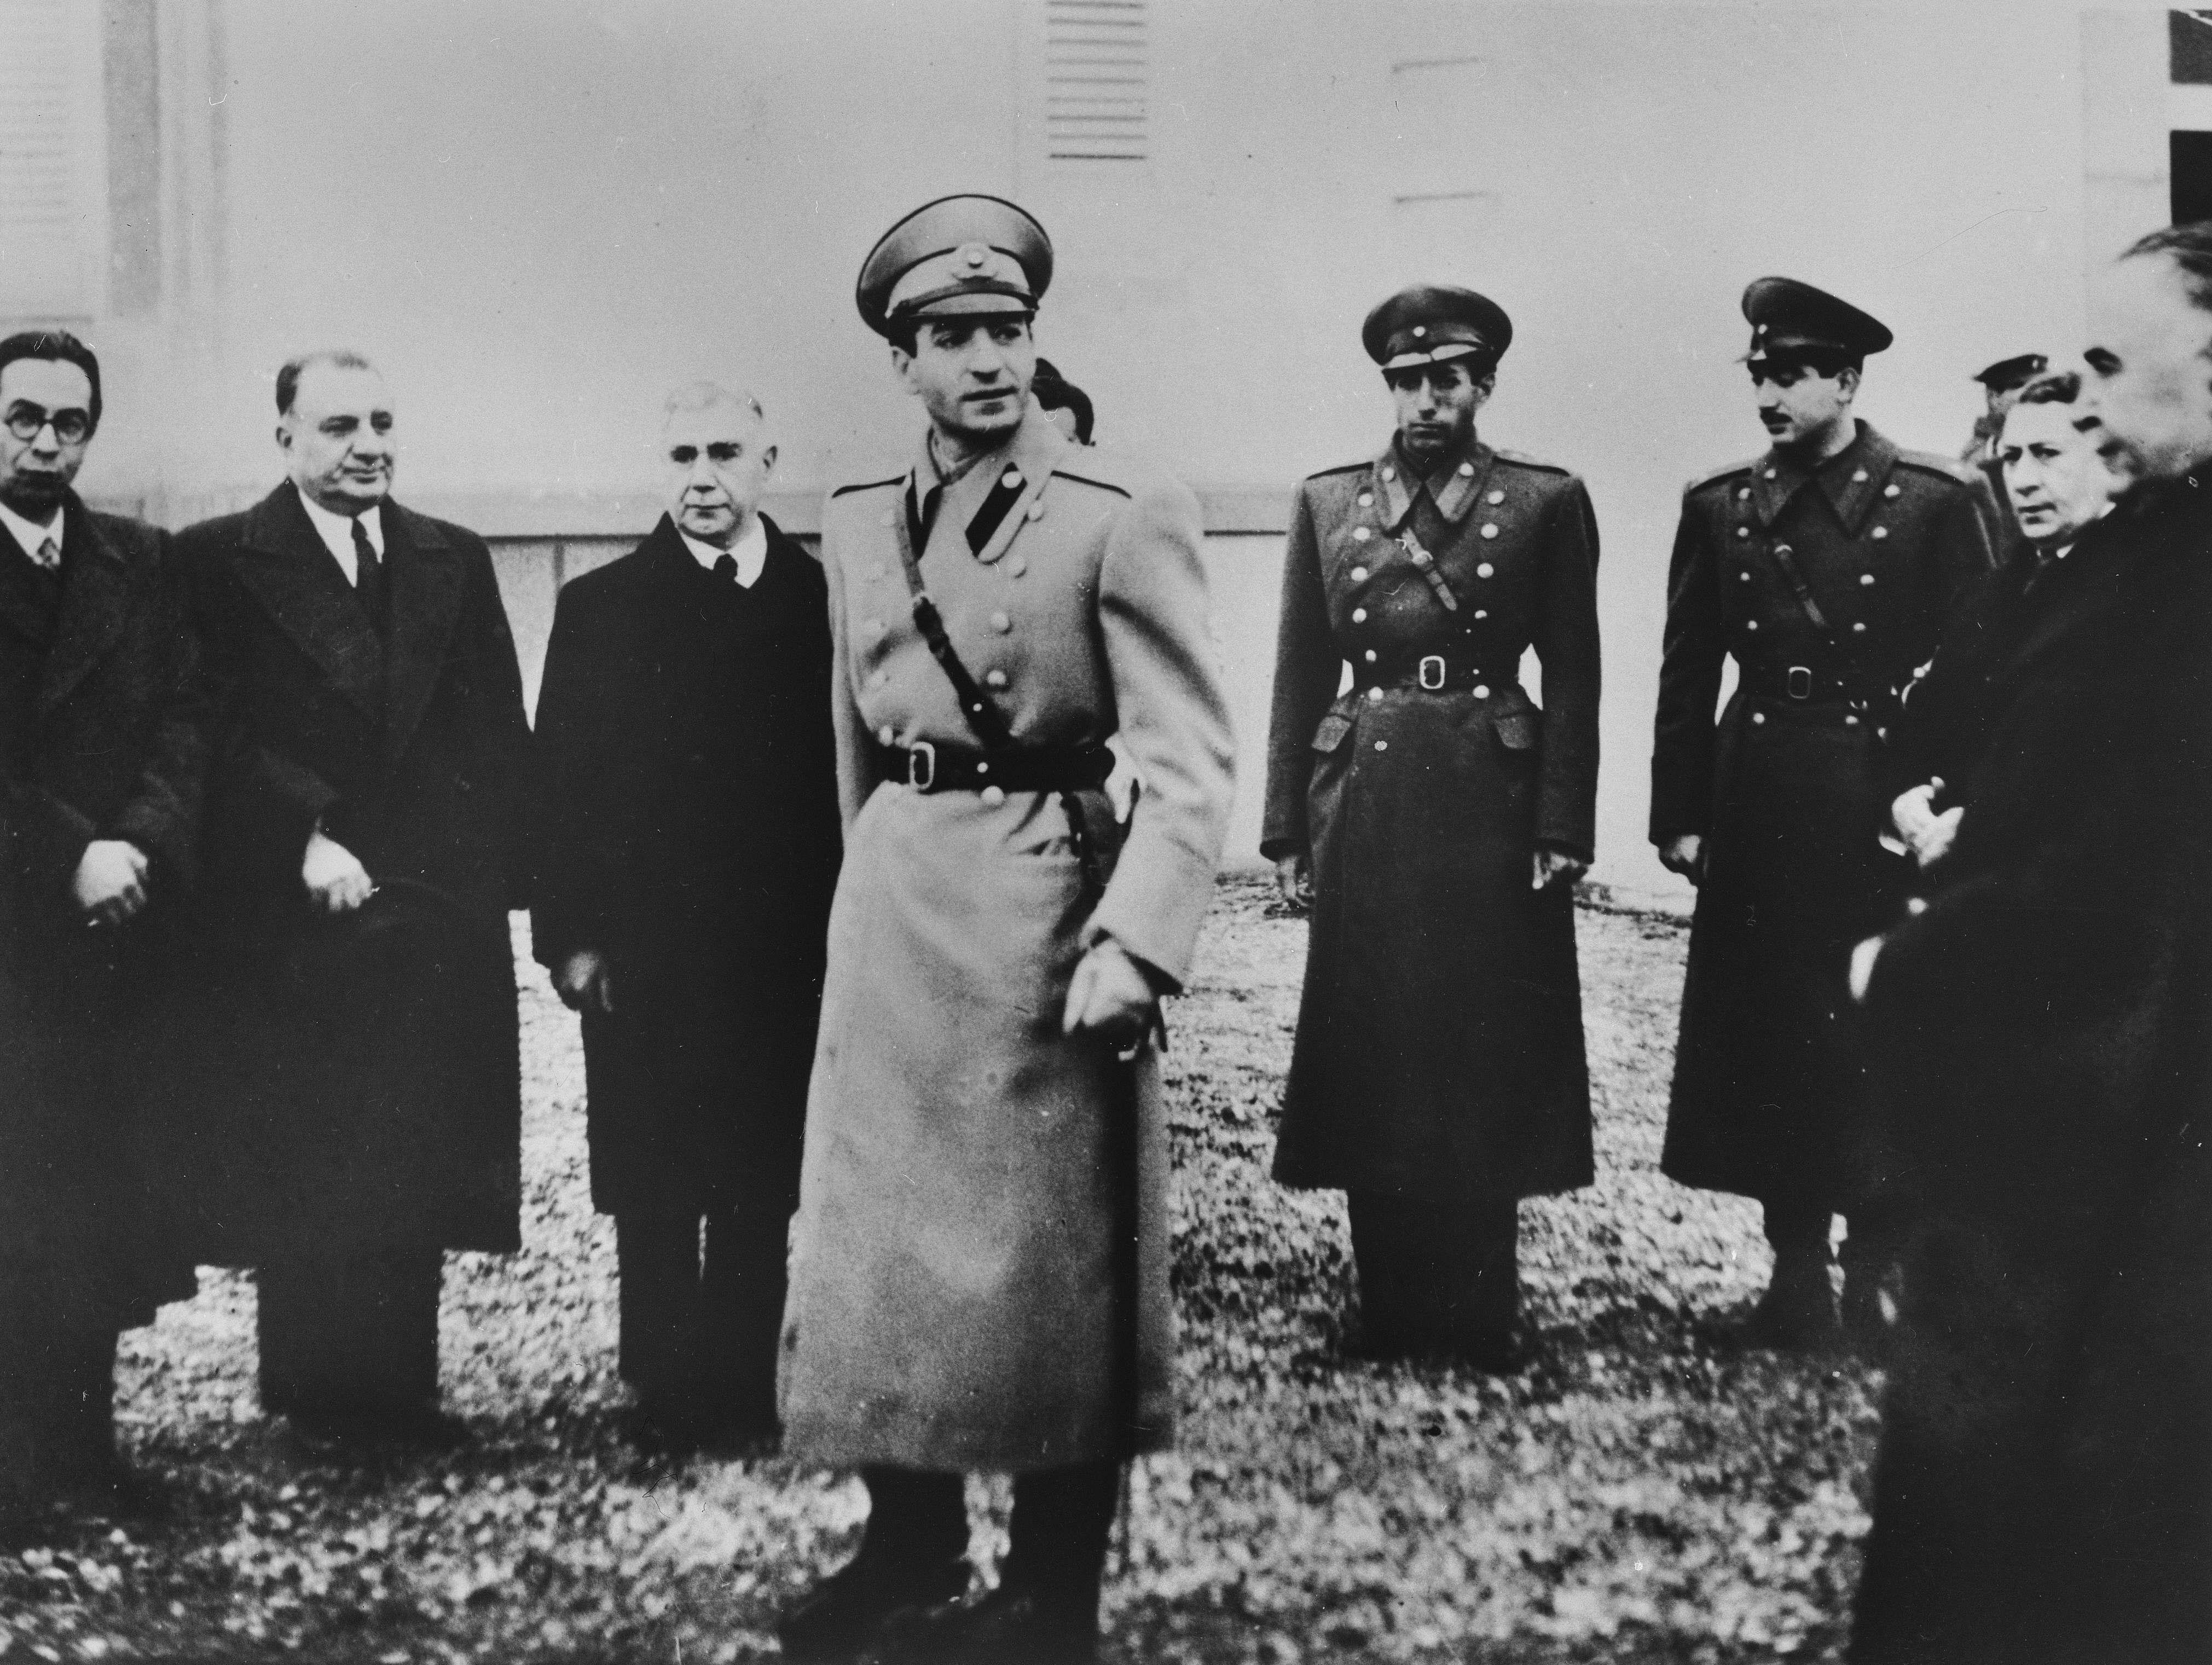 Вступление напрестол Мохаммеда Реза-шаха, 16 сентября 1941 года. Слева — члены правительства, справа — брат шаха Али Реза иТеймур Бахтияр